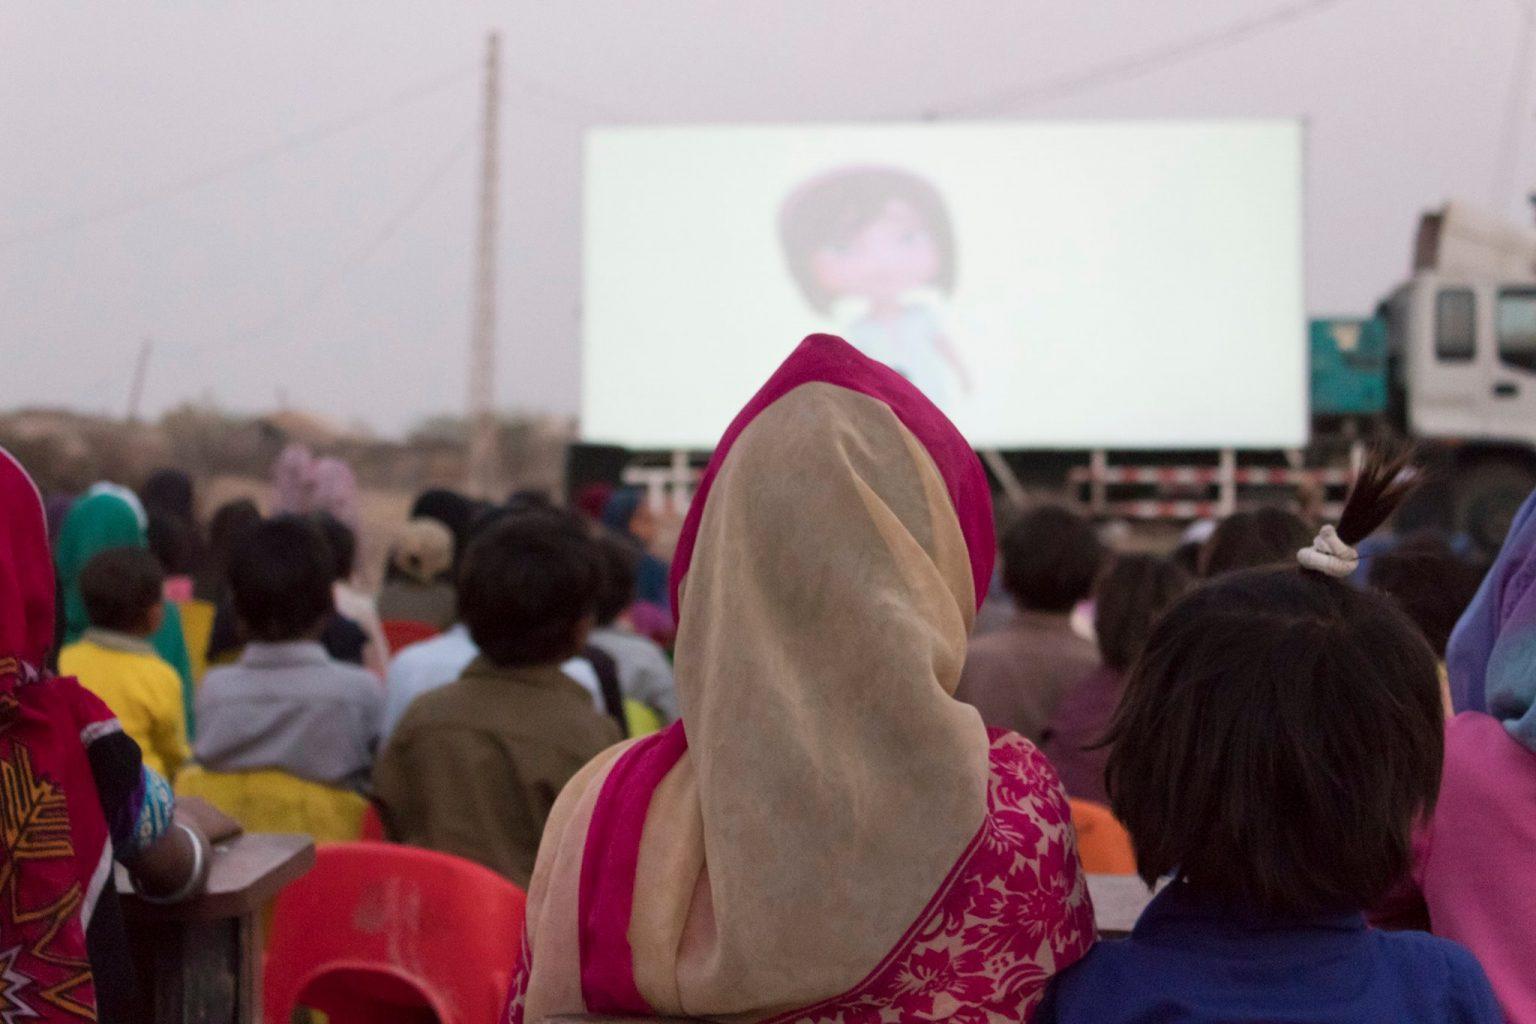 Image: People watching movie on mobile cinema